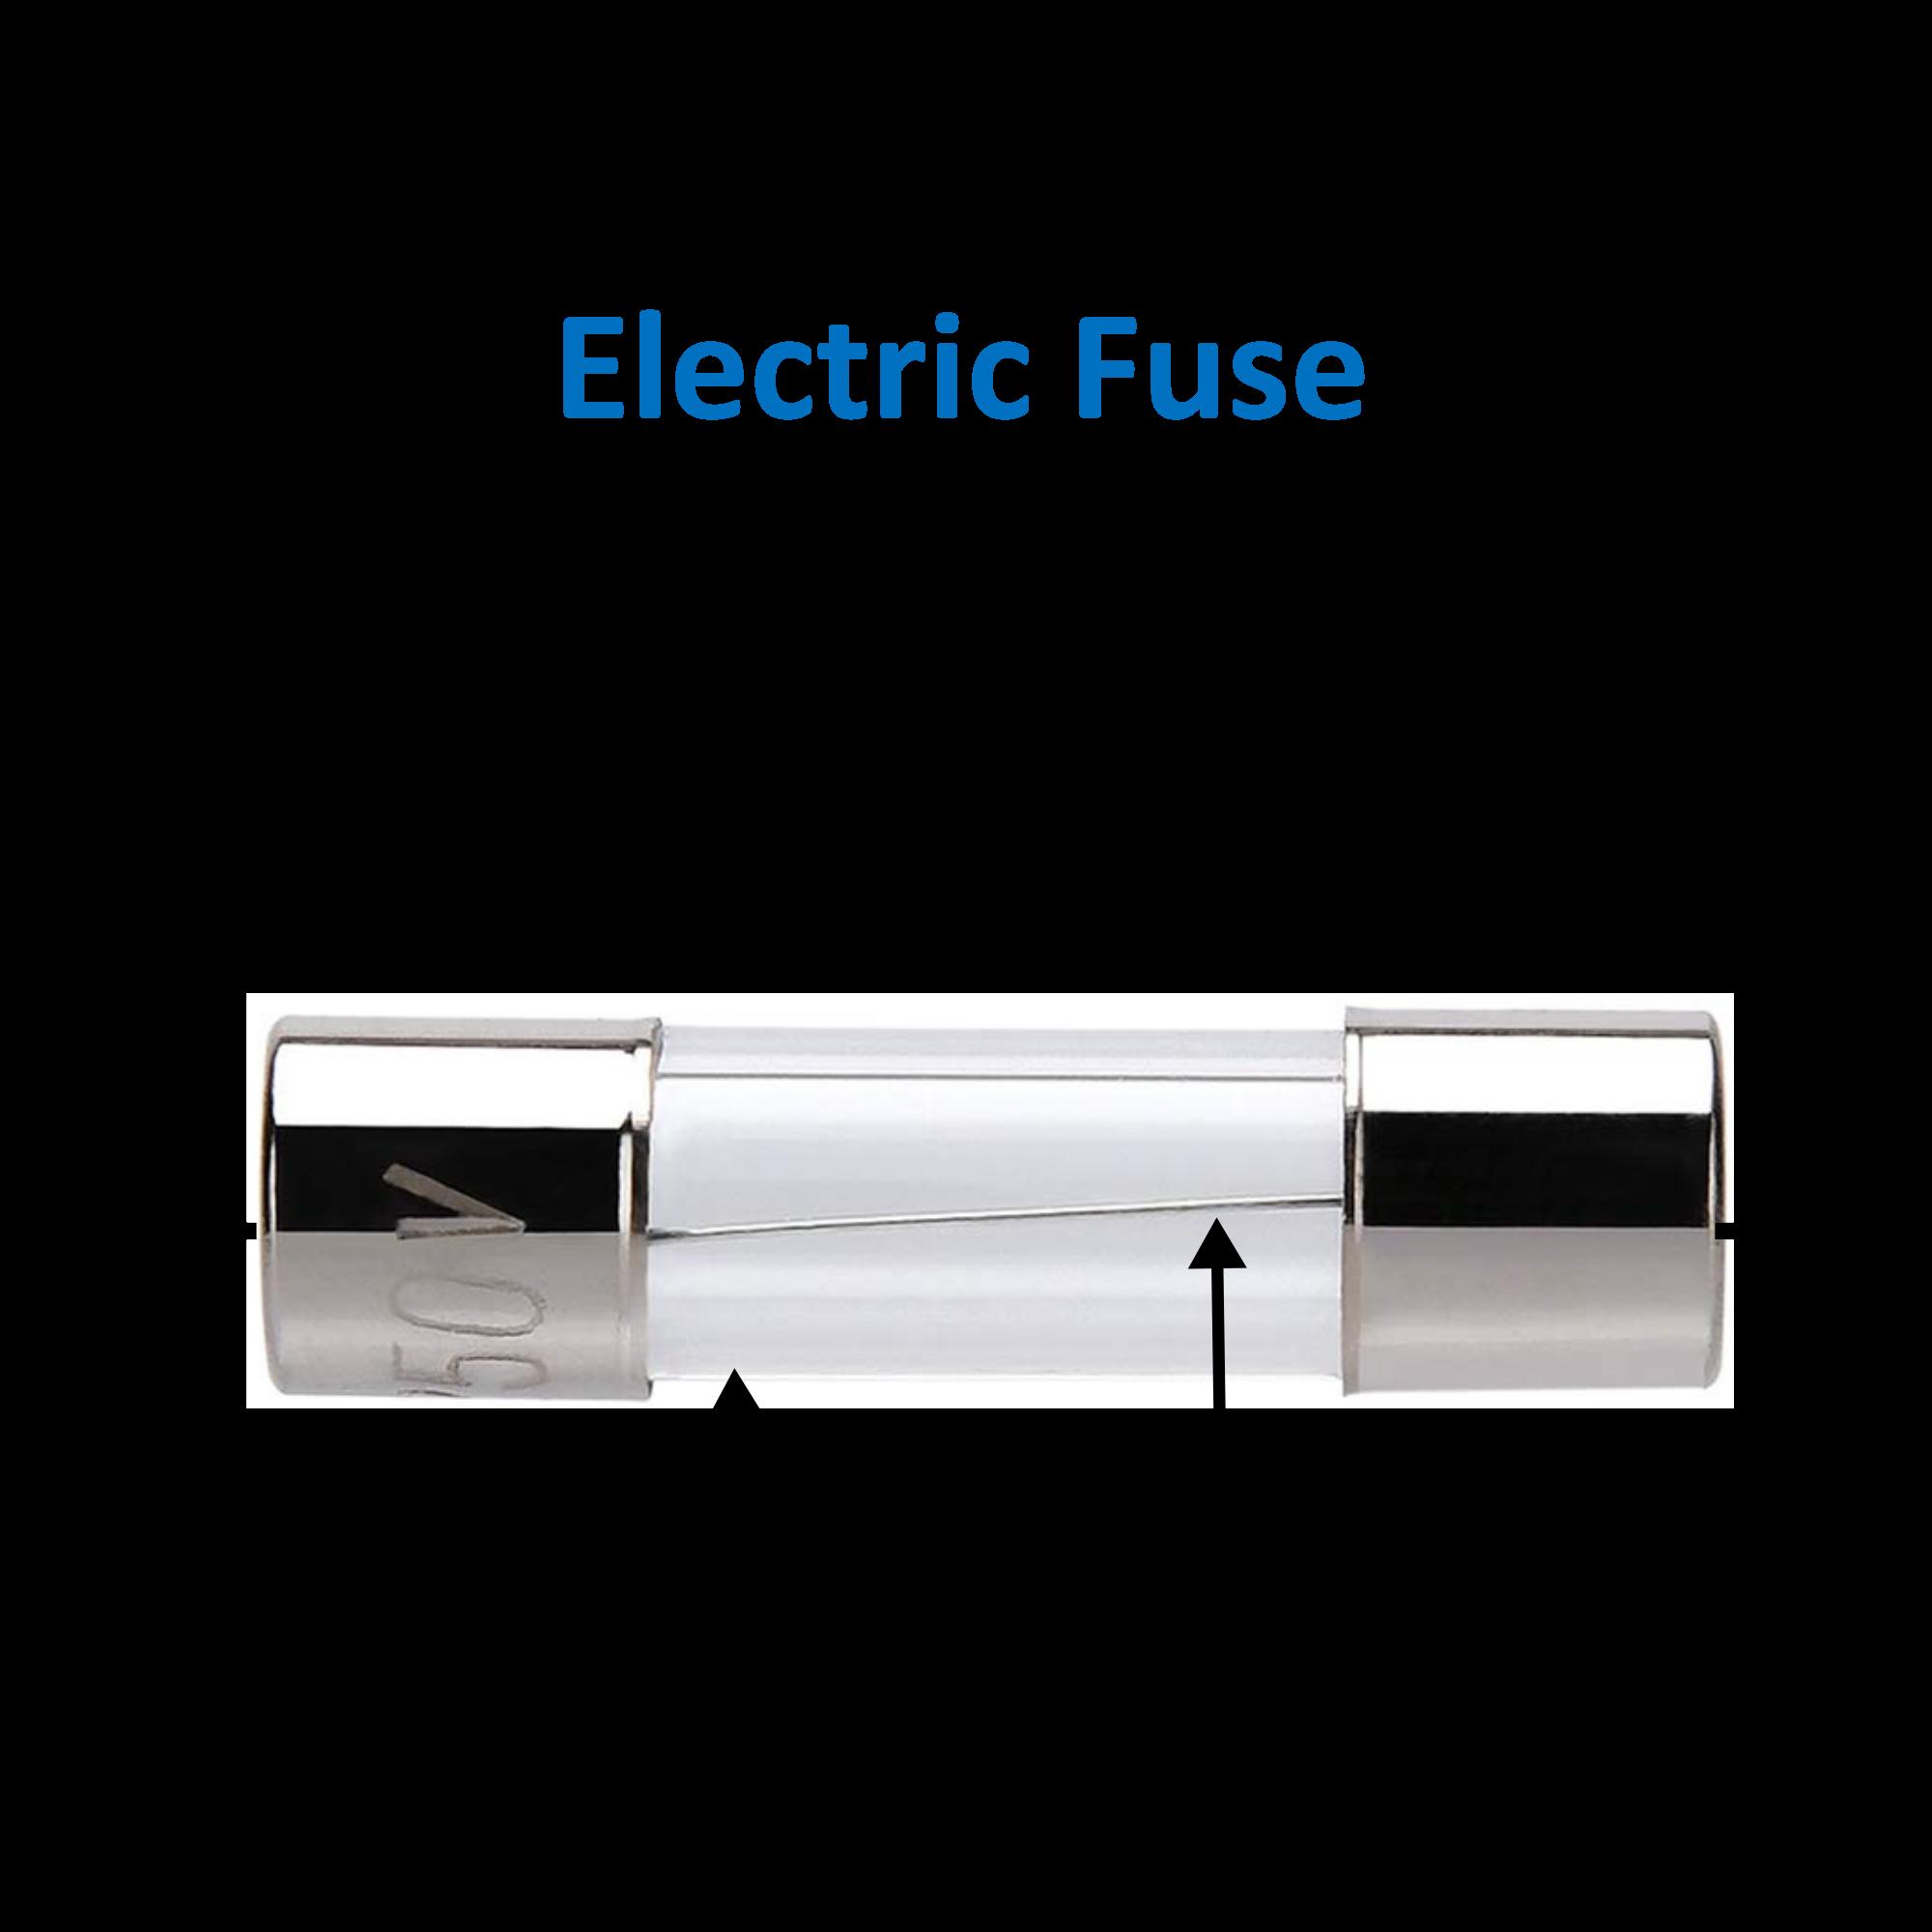 Electric Fuse - Teachoo.png